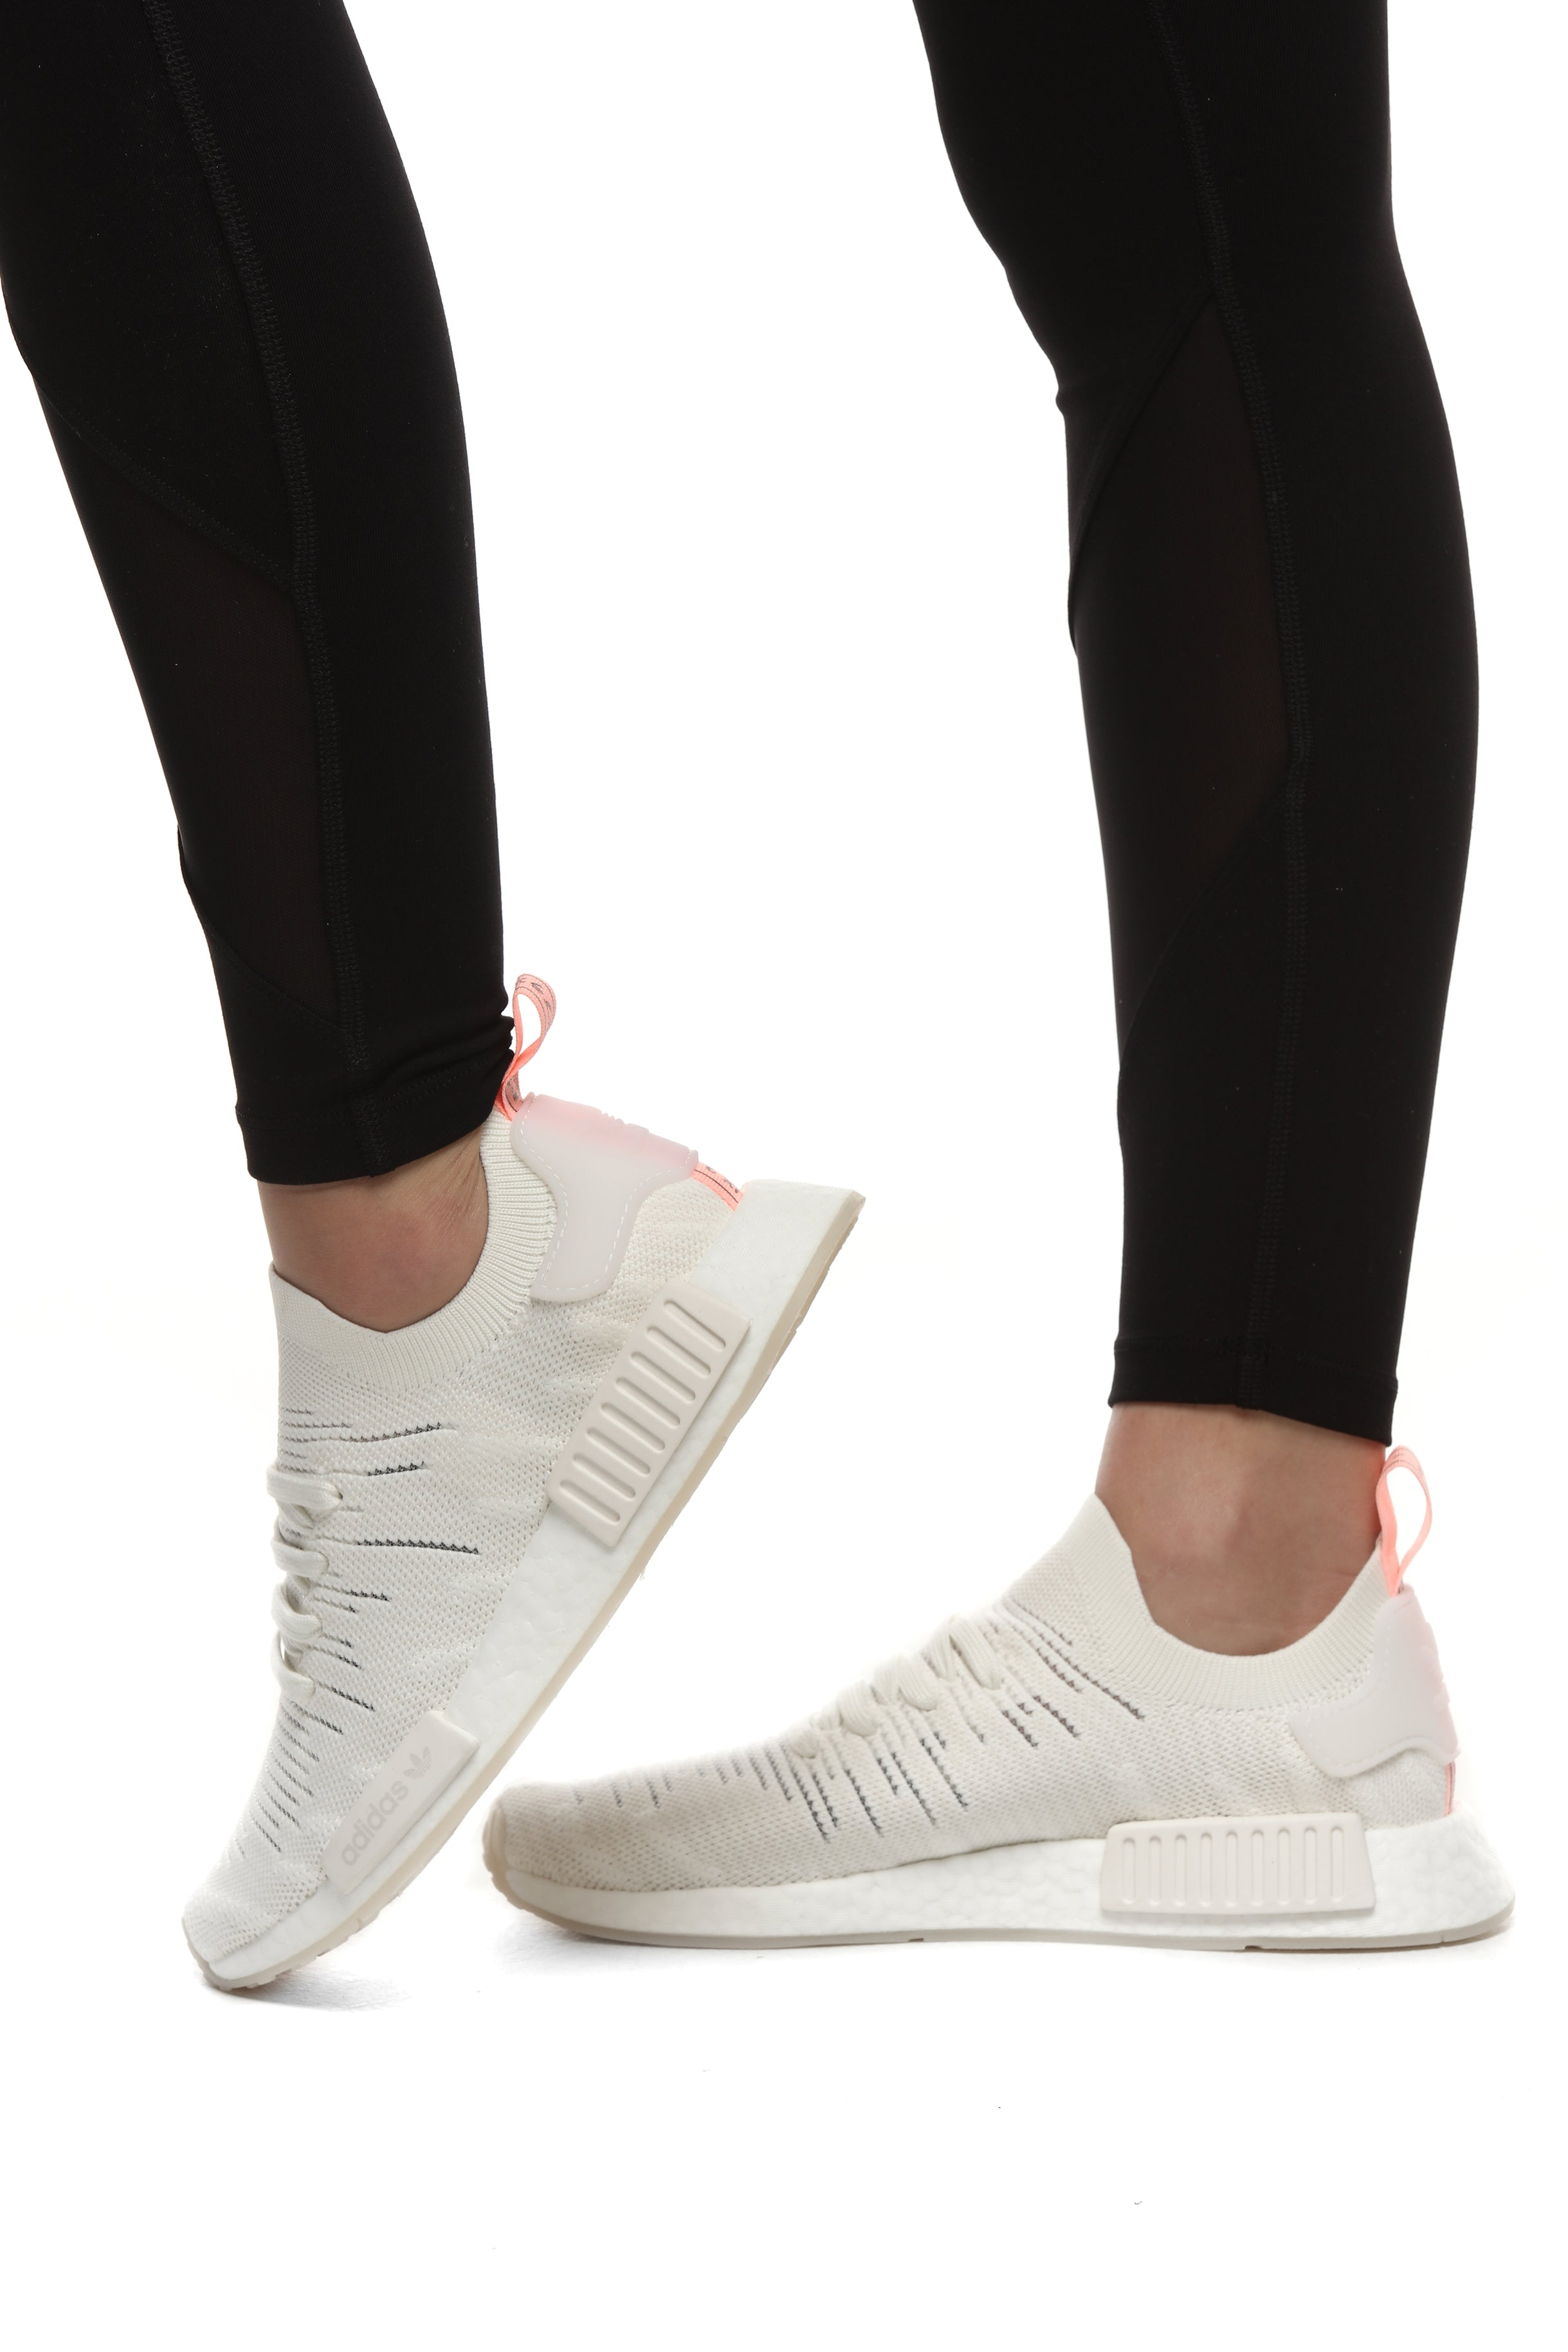 Adidas Women NMD R1 Primeknit CQ2041 GreyWhite Running Shoes